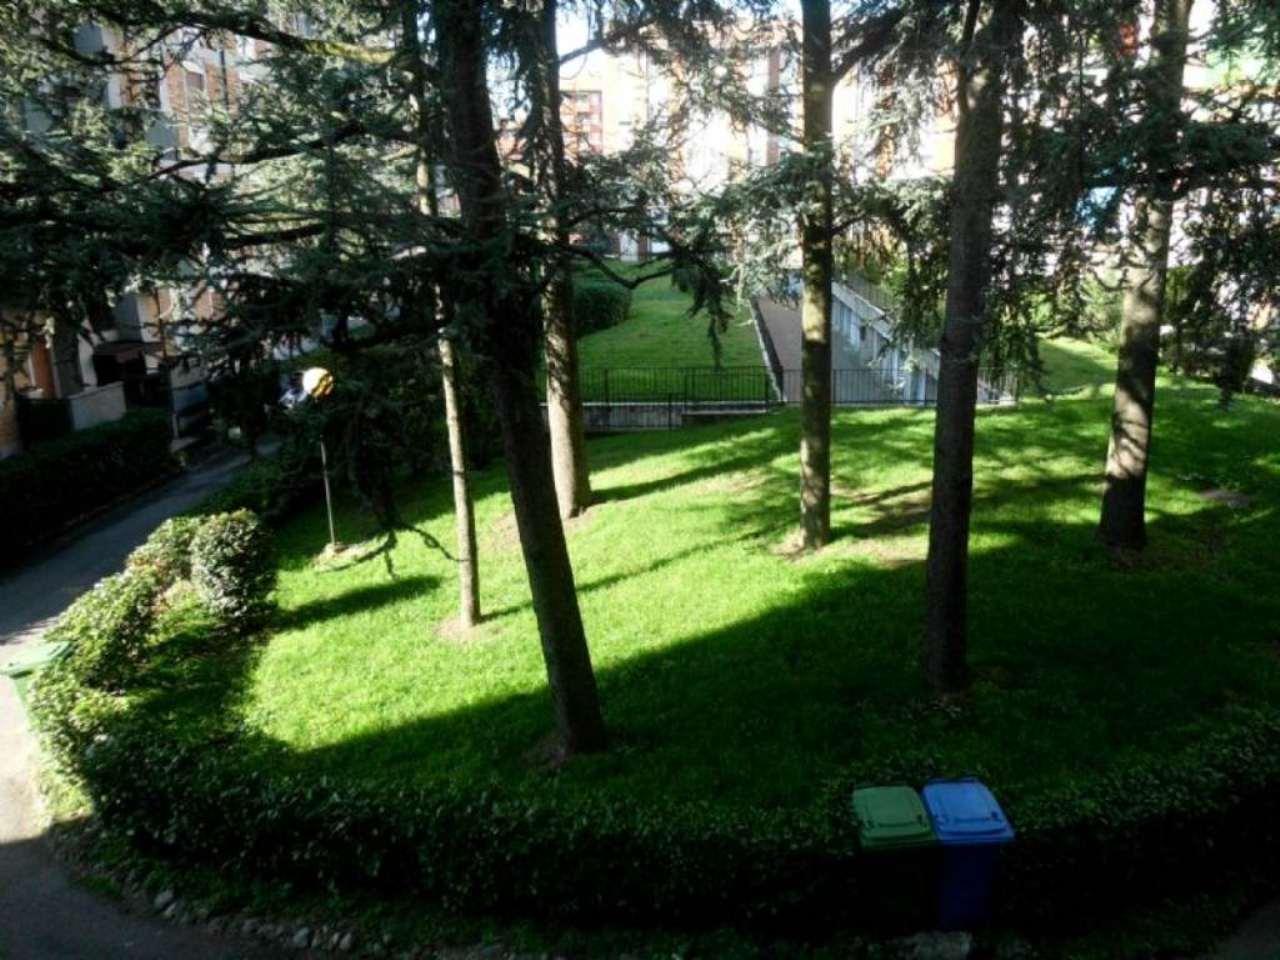 Bilocale Monza Via Pellegrini 1